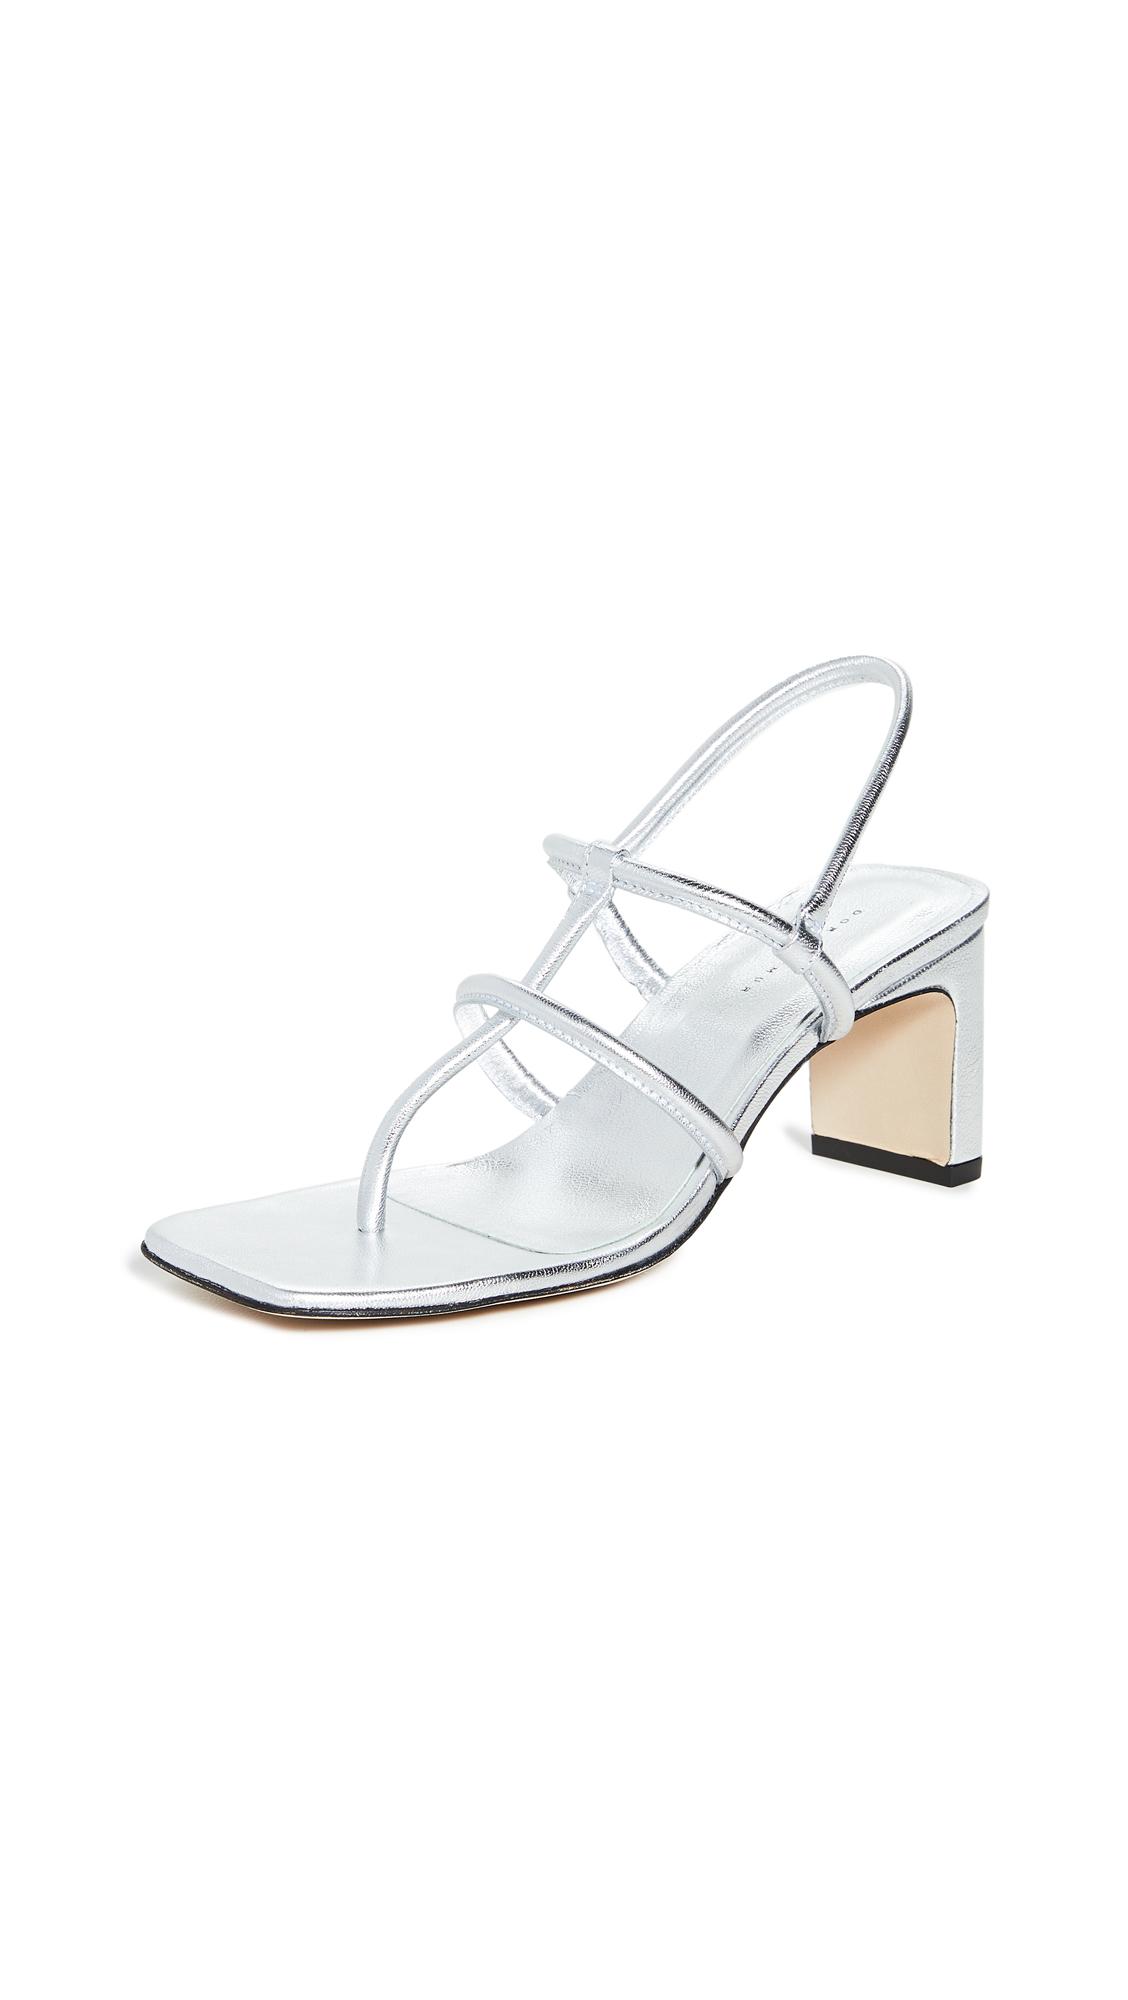 Buy Dorateymur Heeled Thong Sandals online, shop Dorateymur